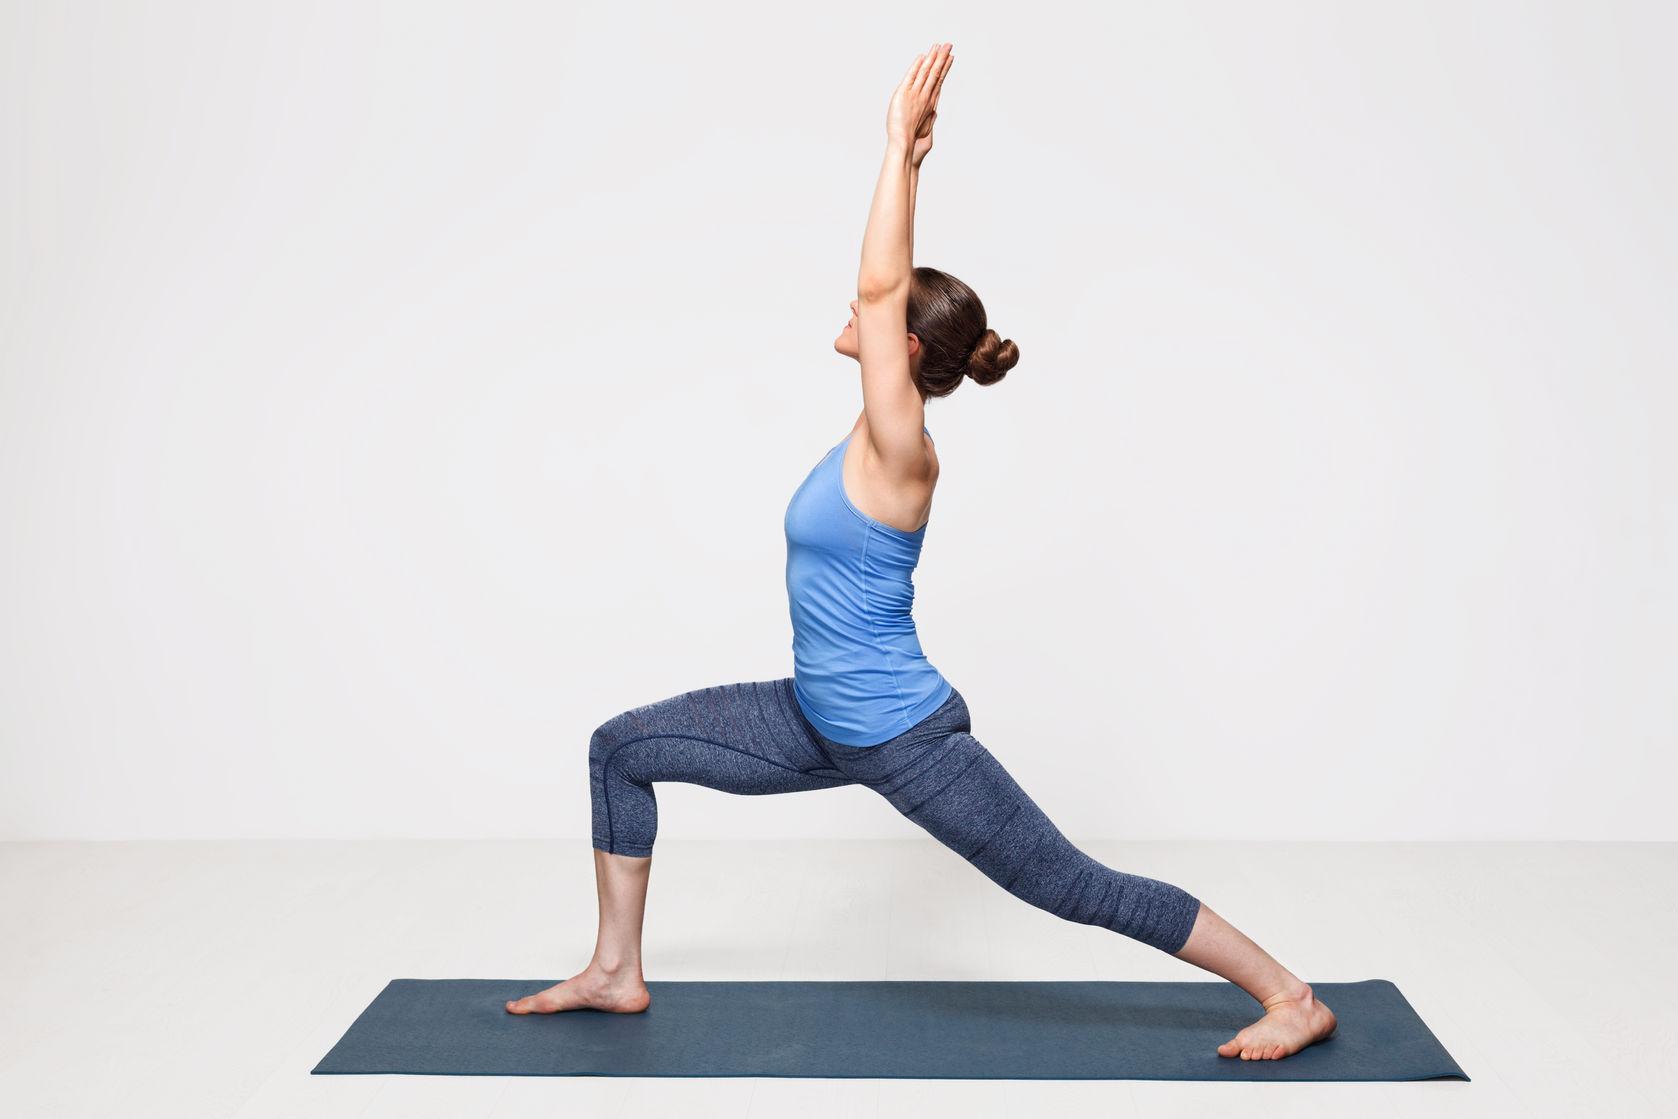 50988754 - beautiful sporty fit yogini woman practices yoga asana virabhadrasana 1 - warrior pose 1